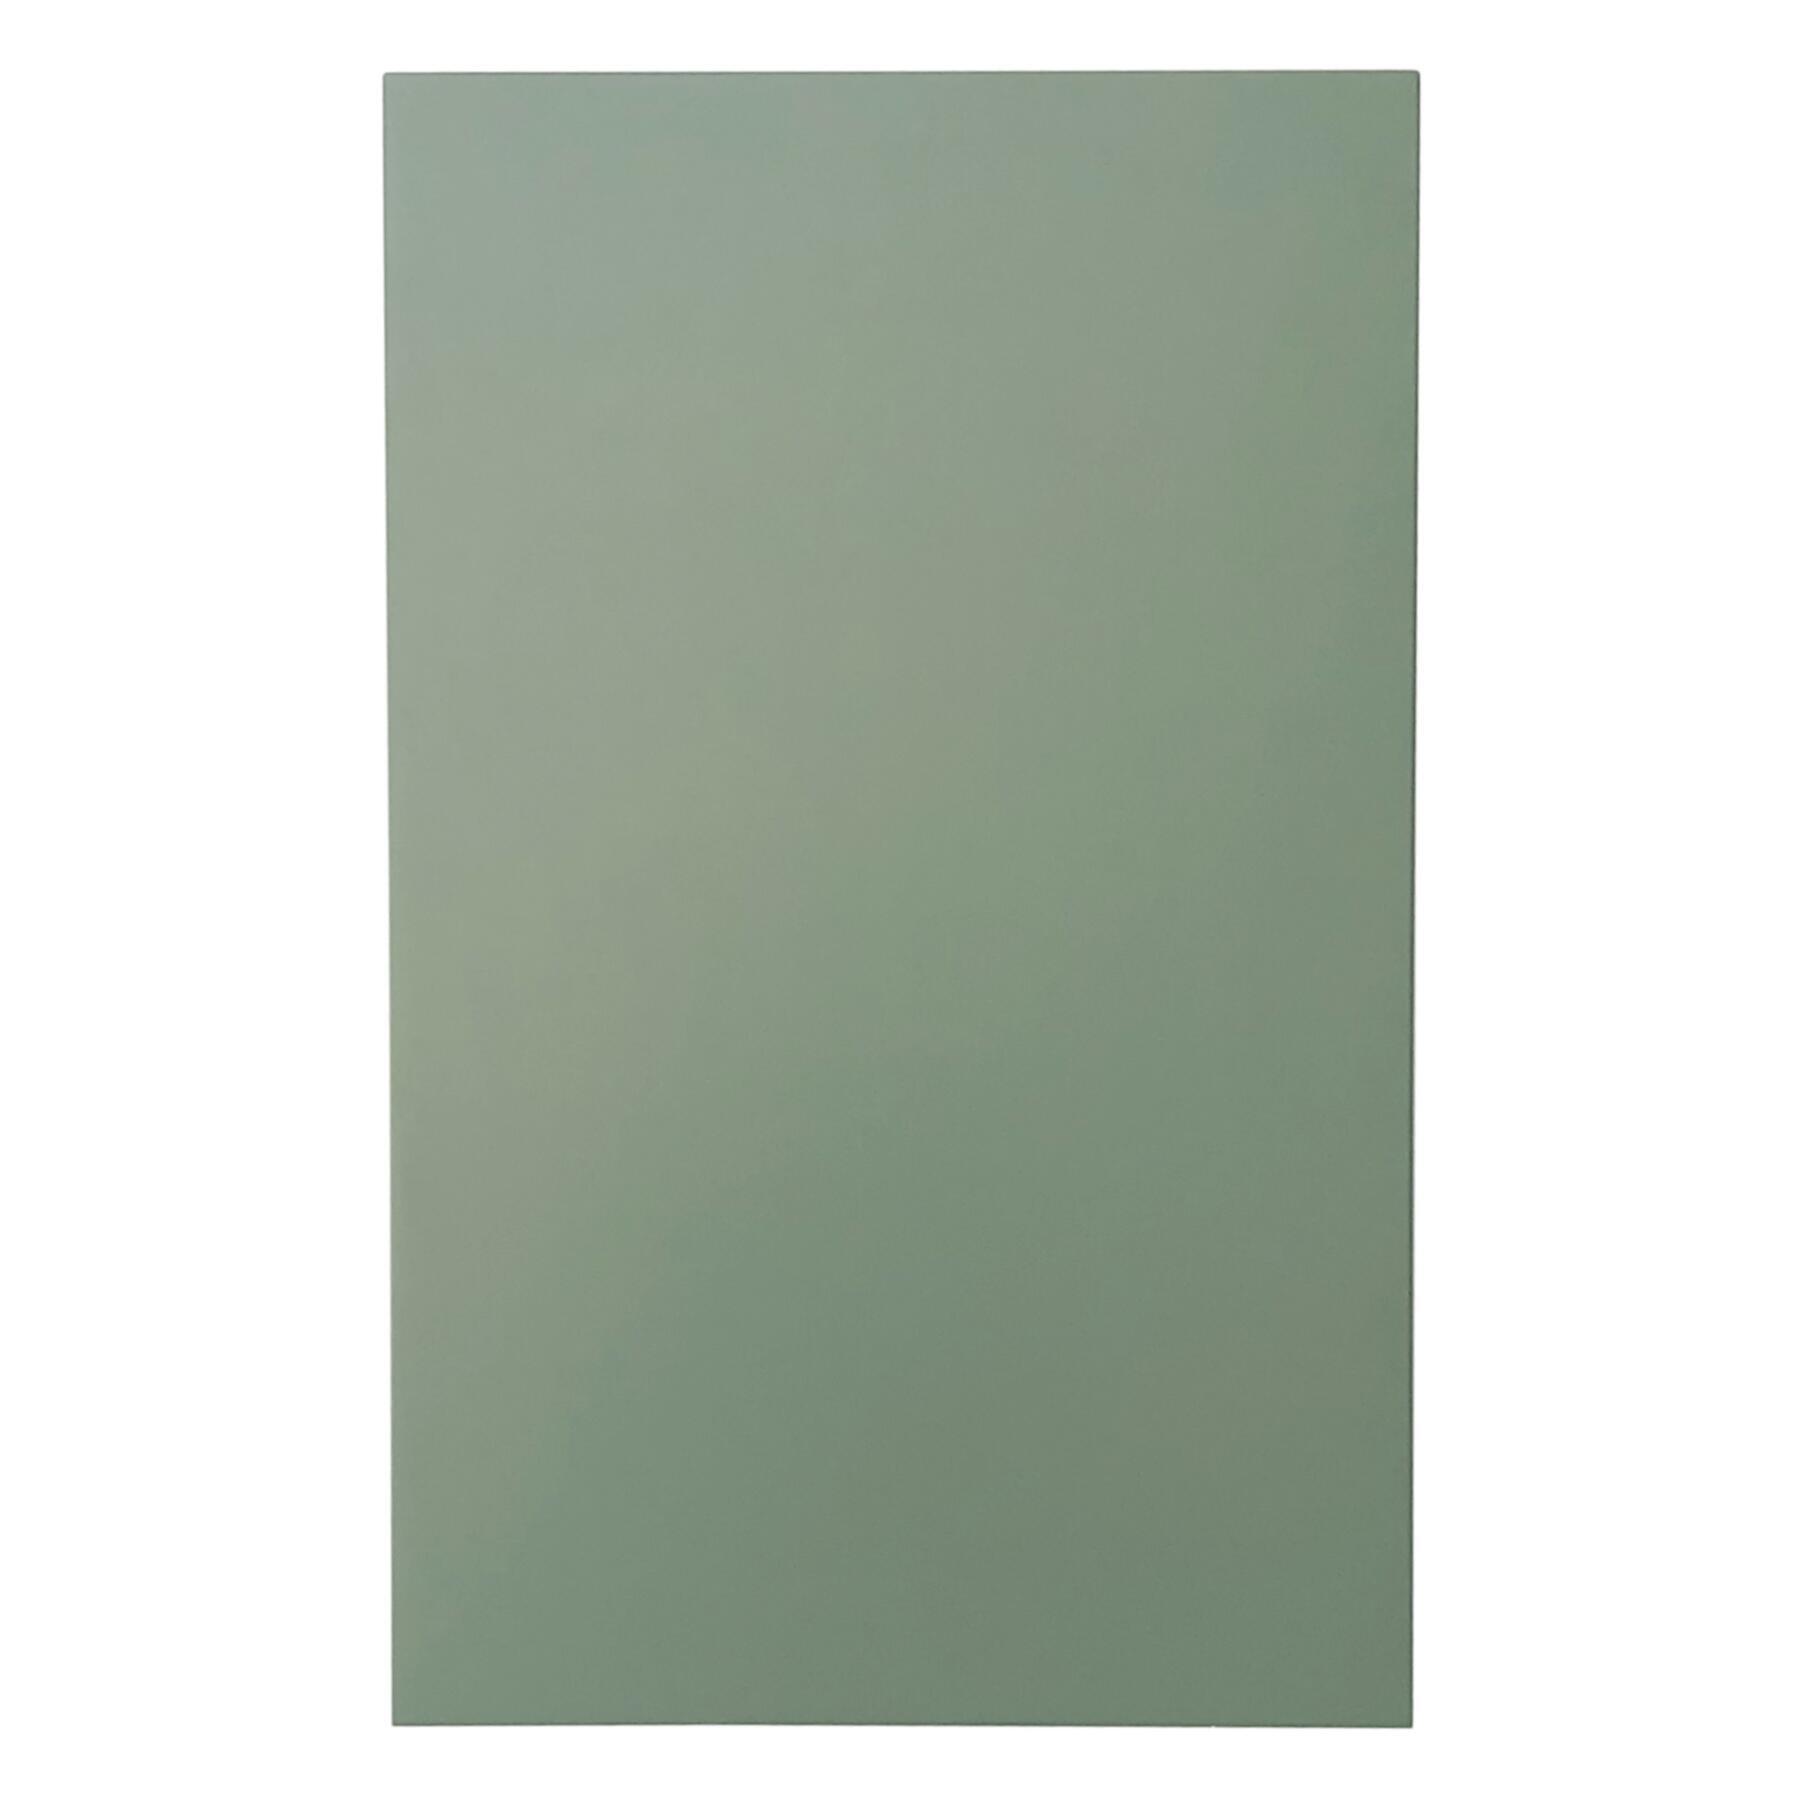 Anta DELINIA ID Parigi 76.5 x 59.7 verde muschio